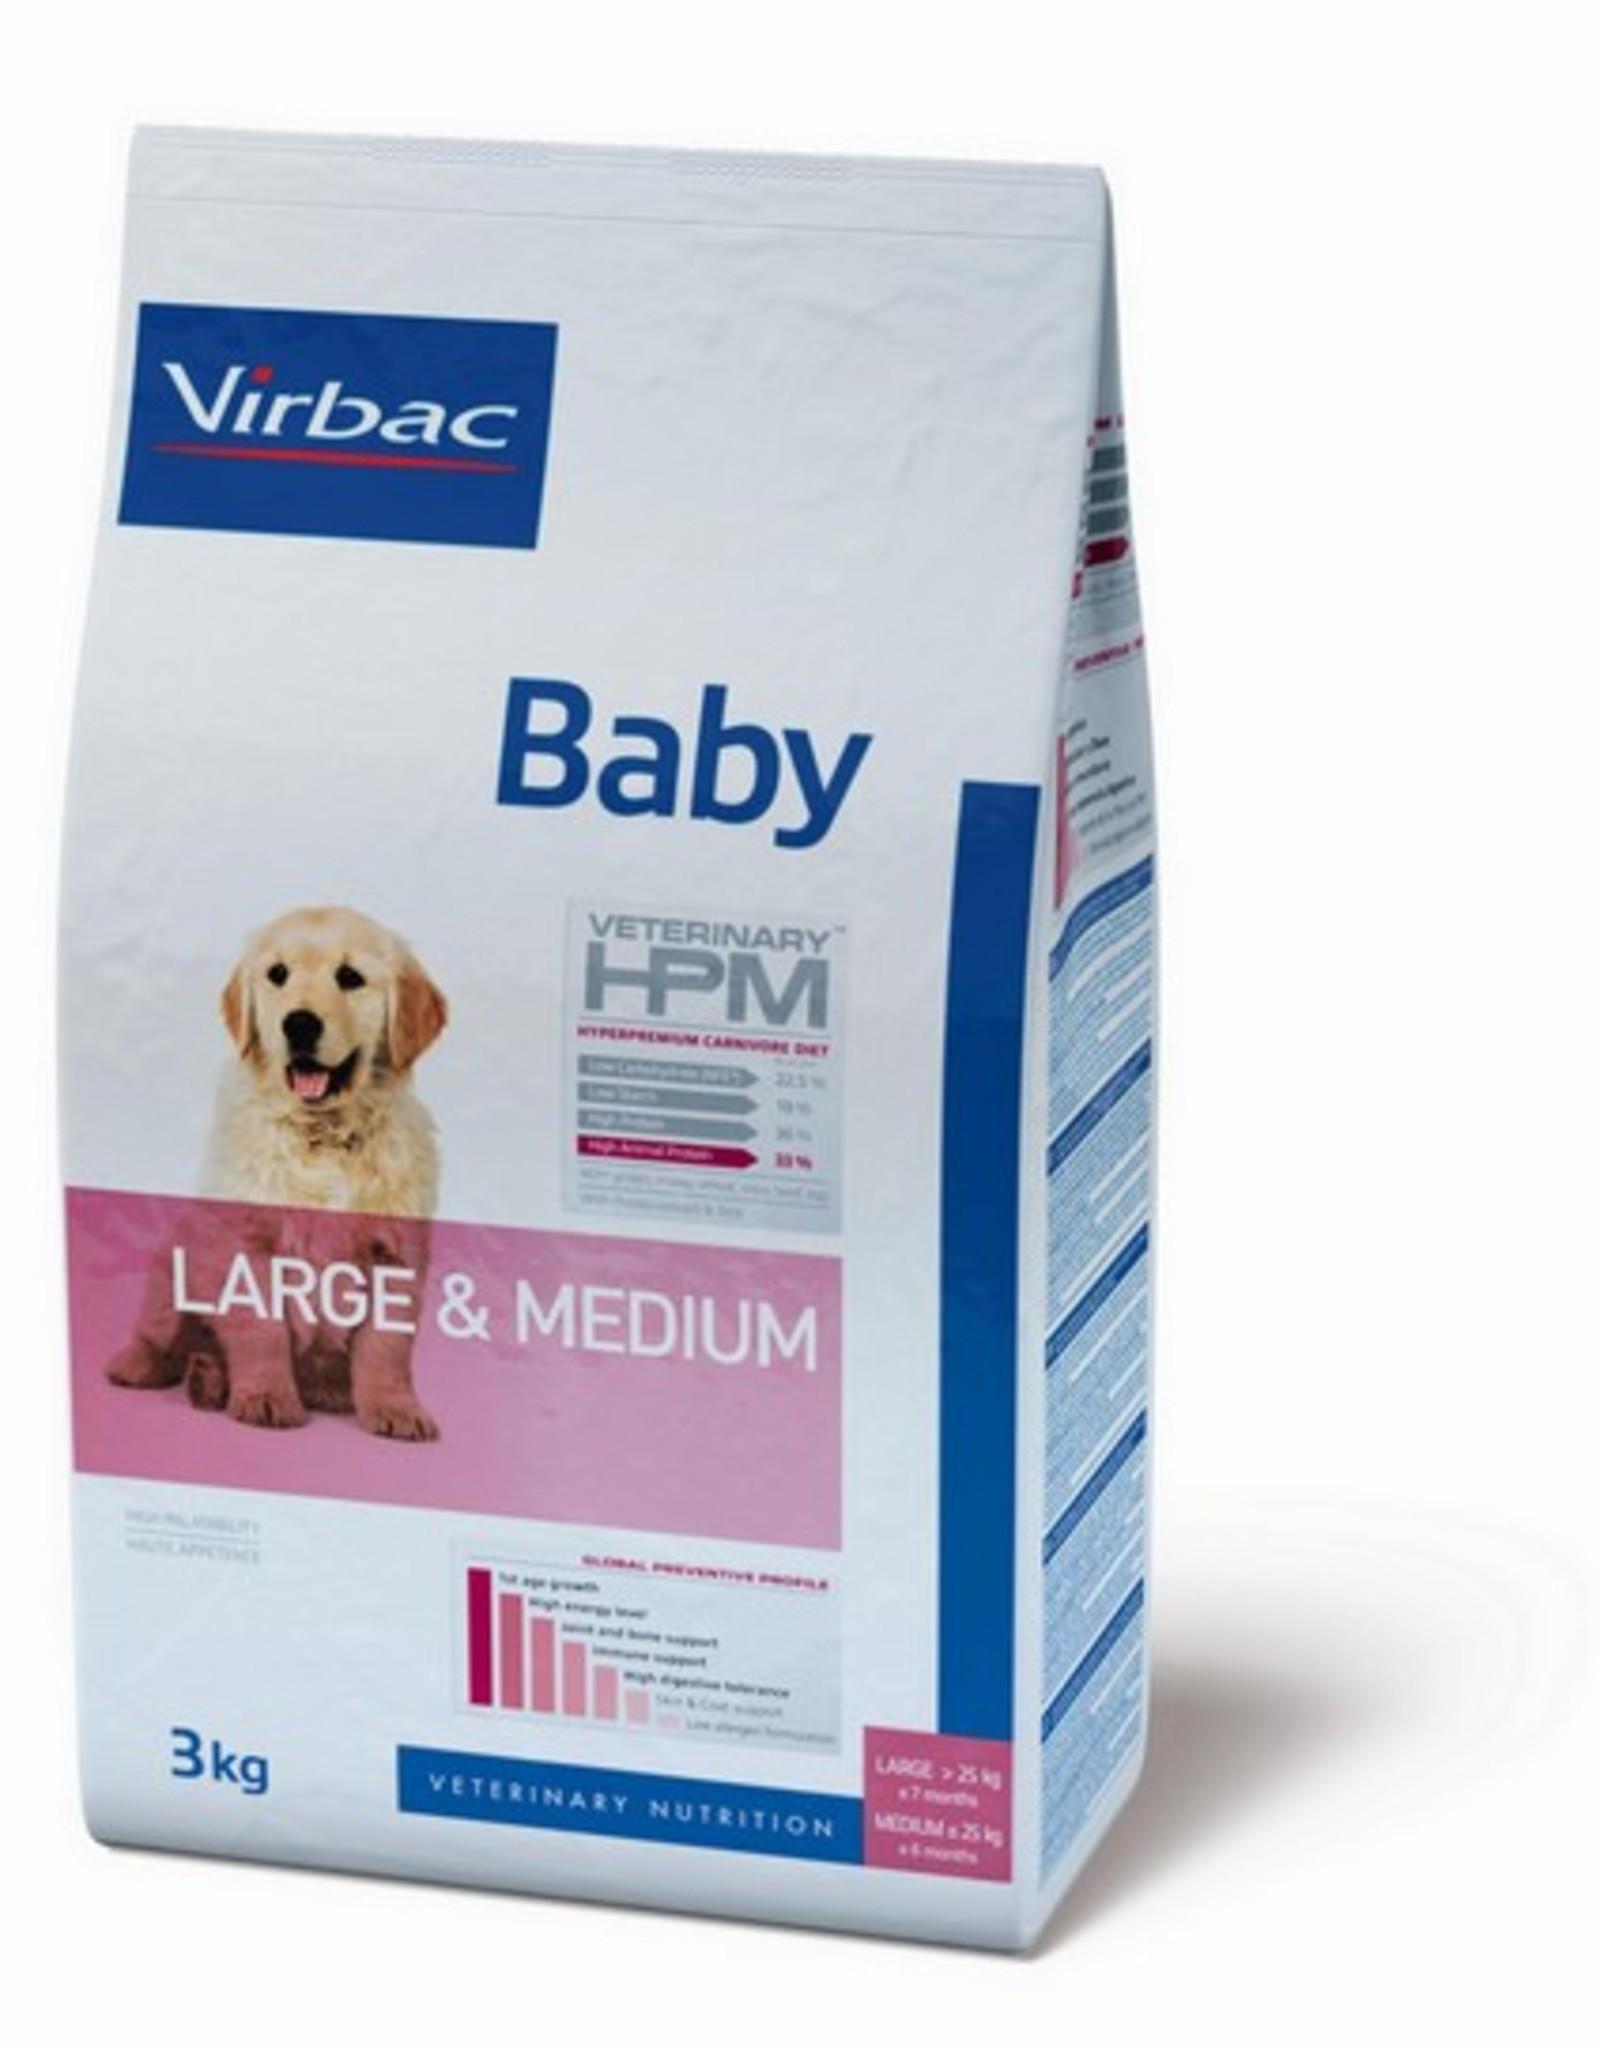 Virbac Virbac Hpm Dog Baby Large/medium Breed 3kg